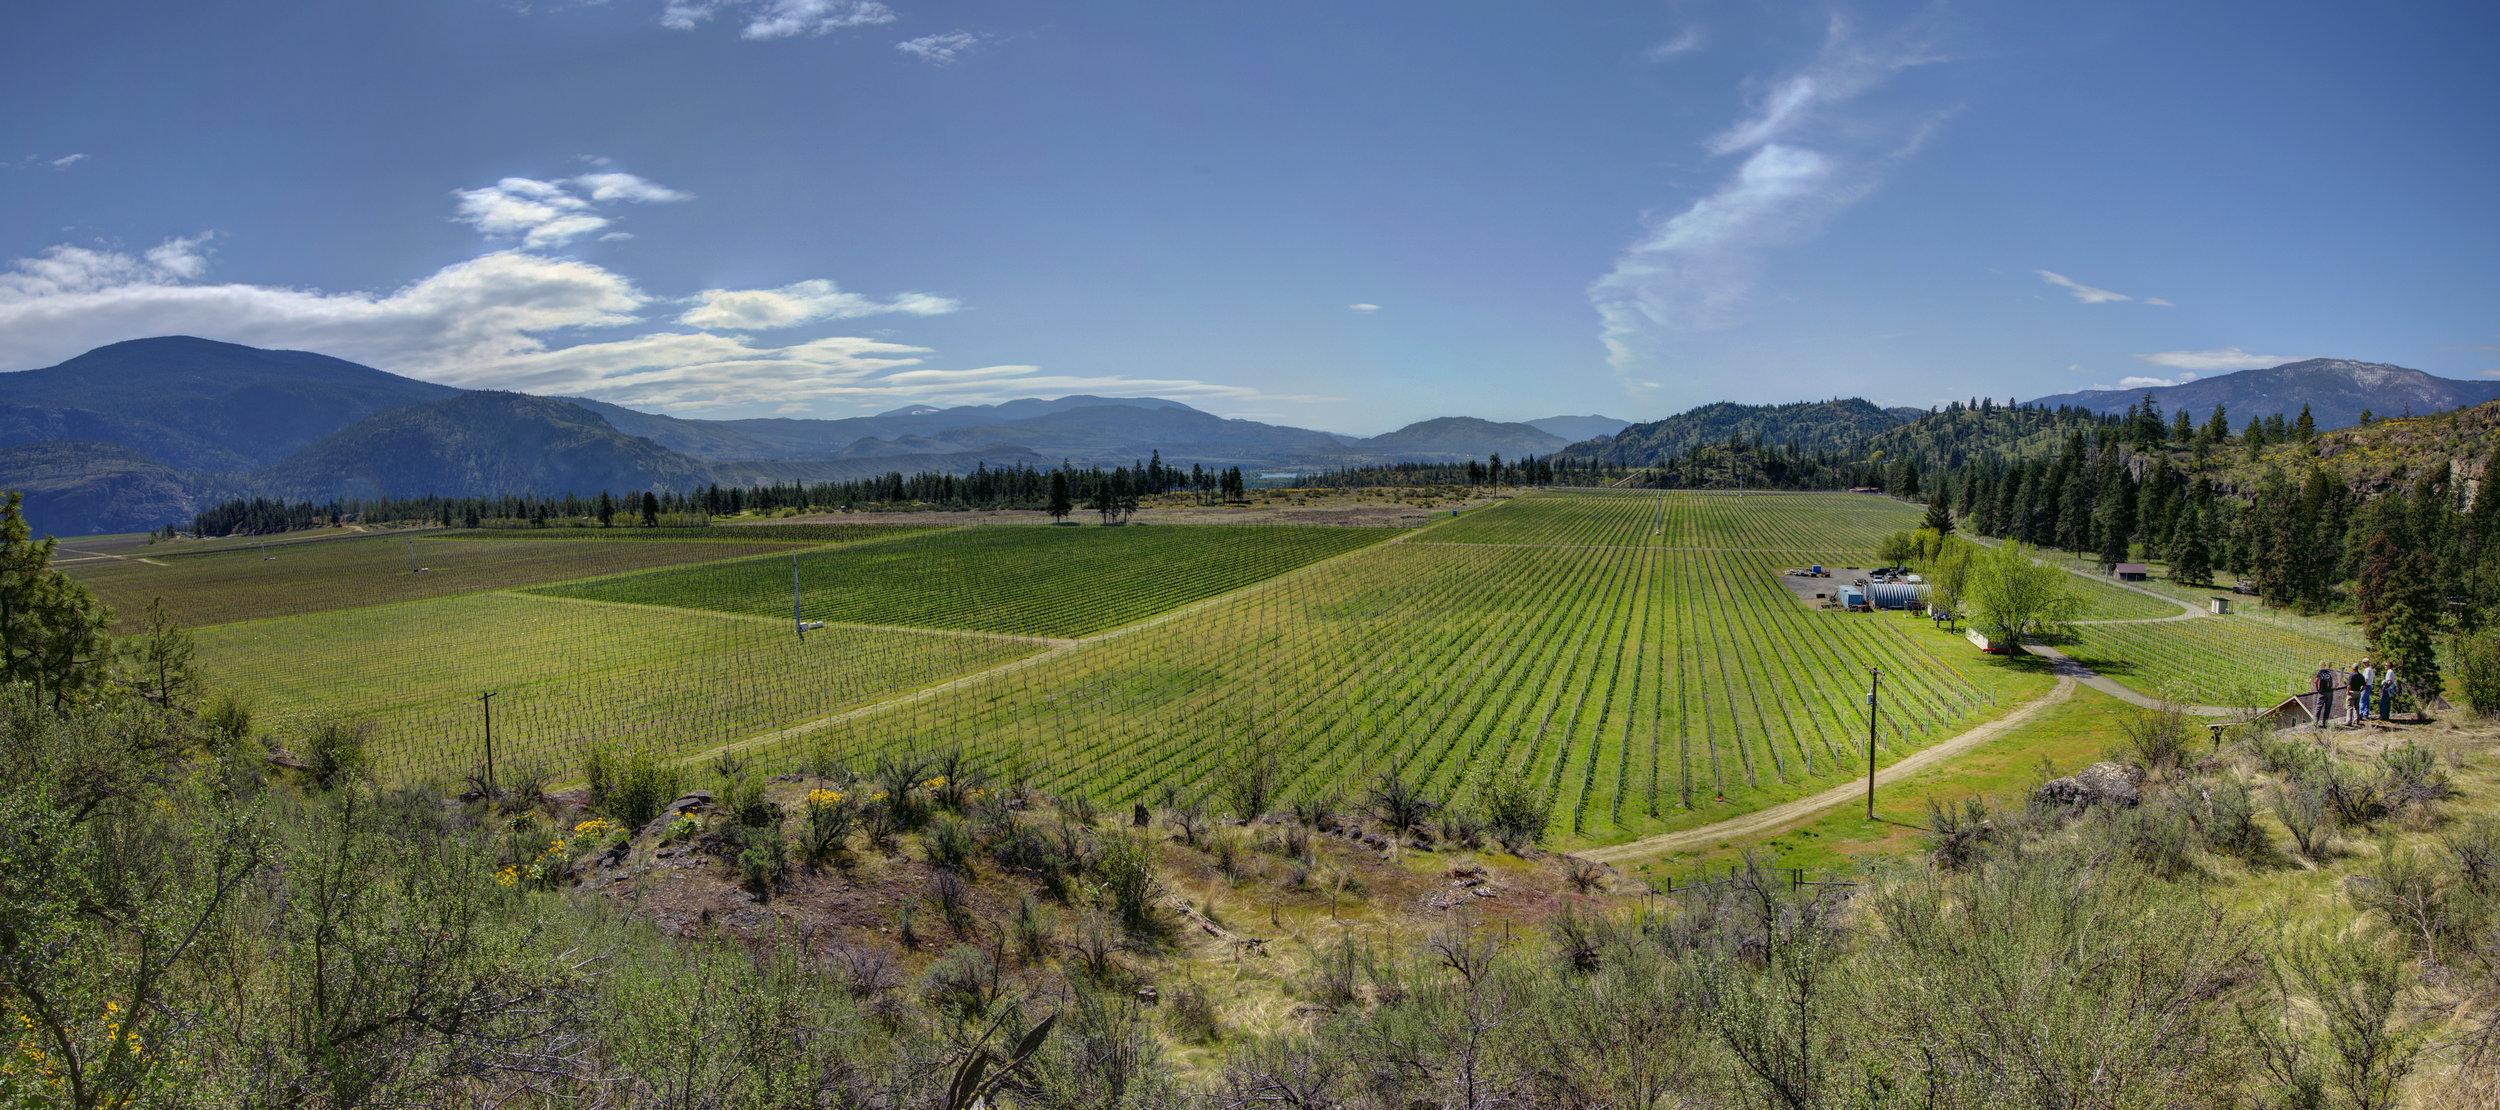 Okanagan Crush Pad winery acquires Secrest Mountain Vineyard.